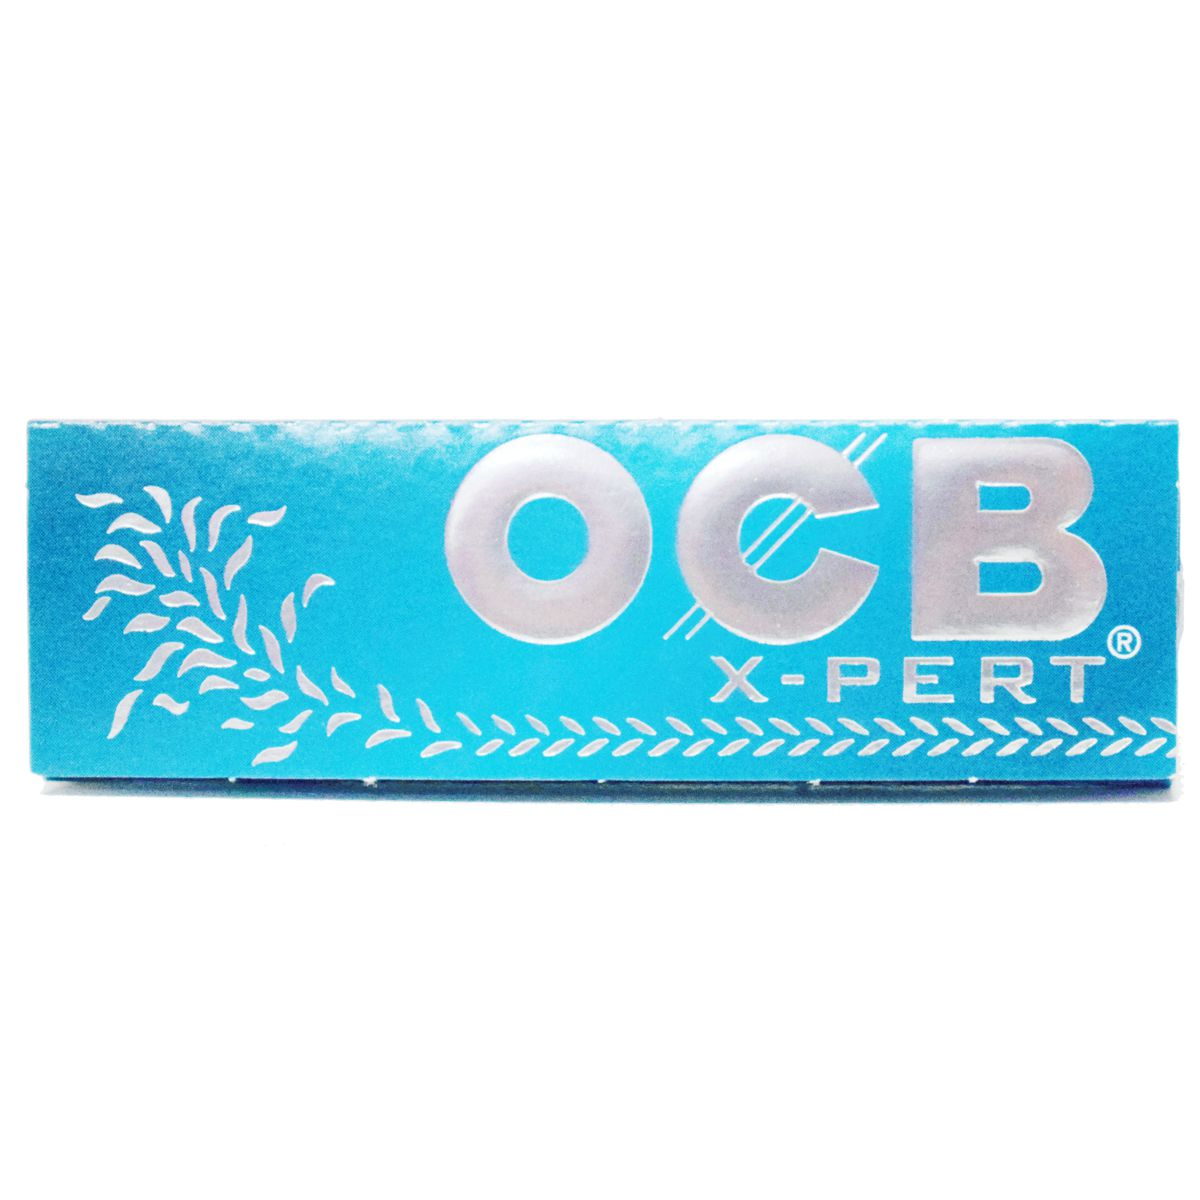 papel ocb xpert blue 70mm